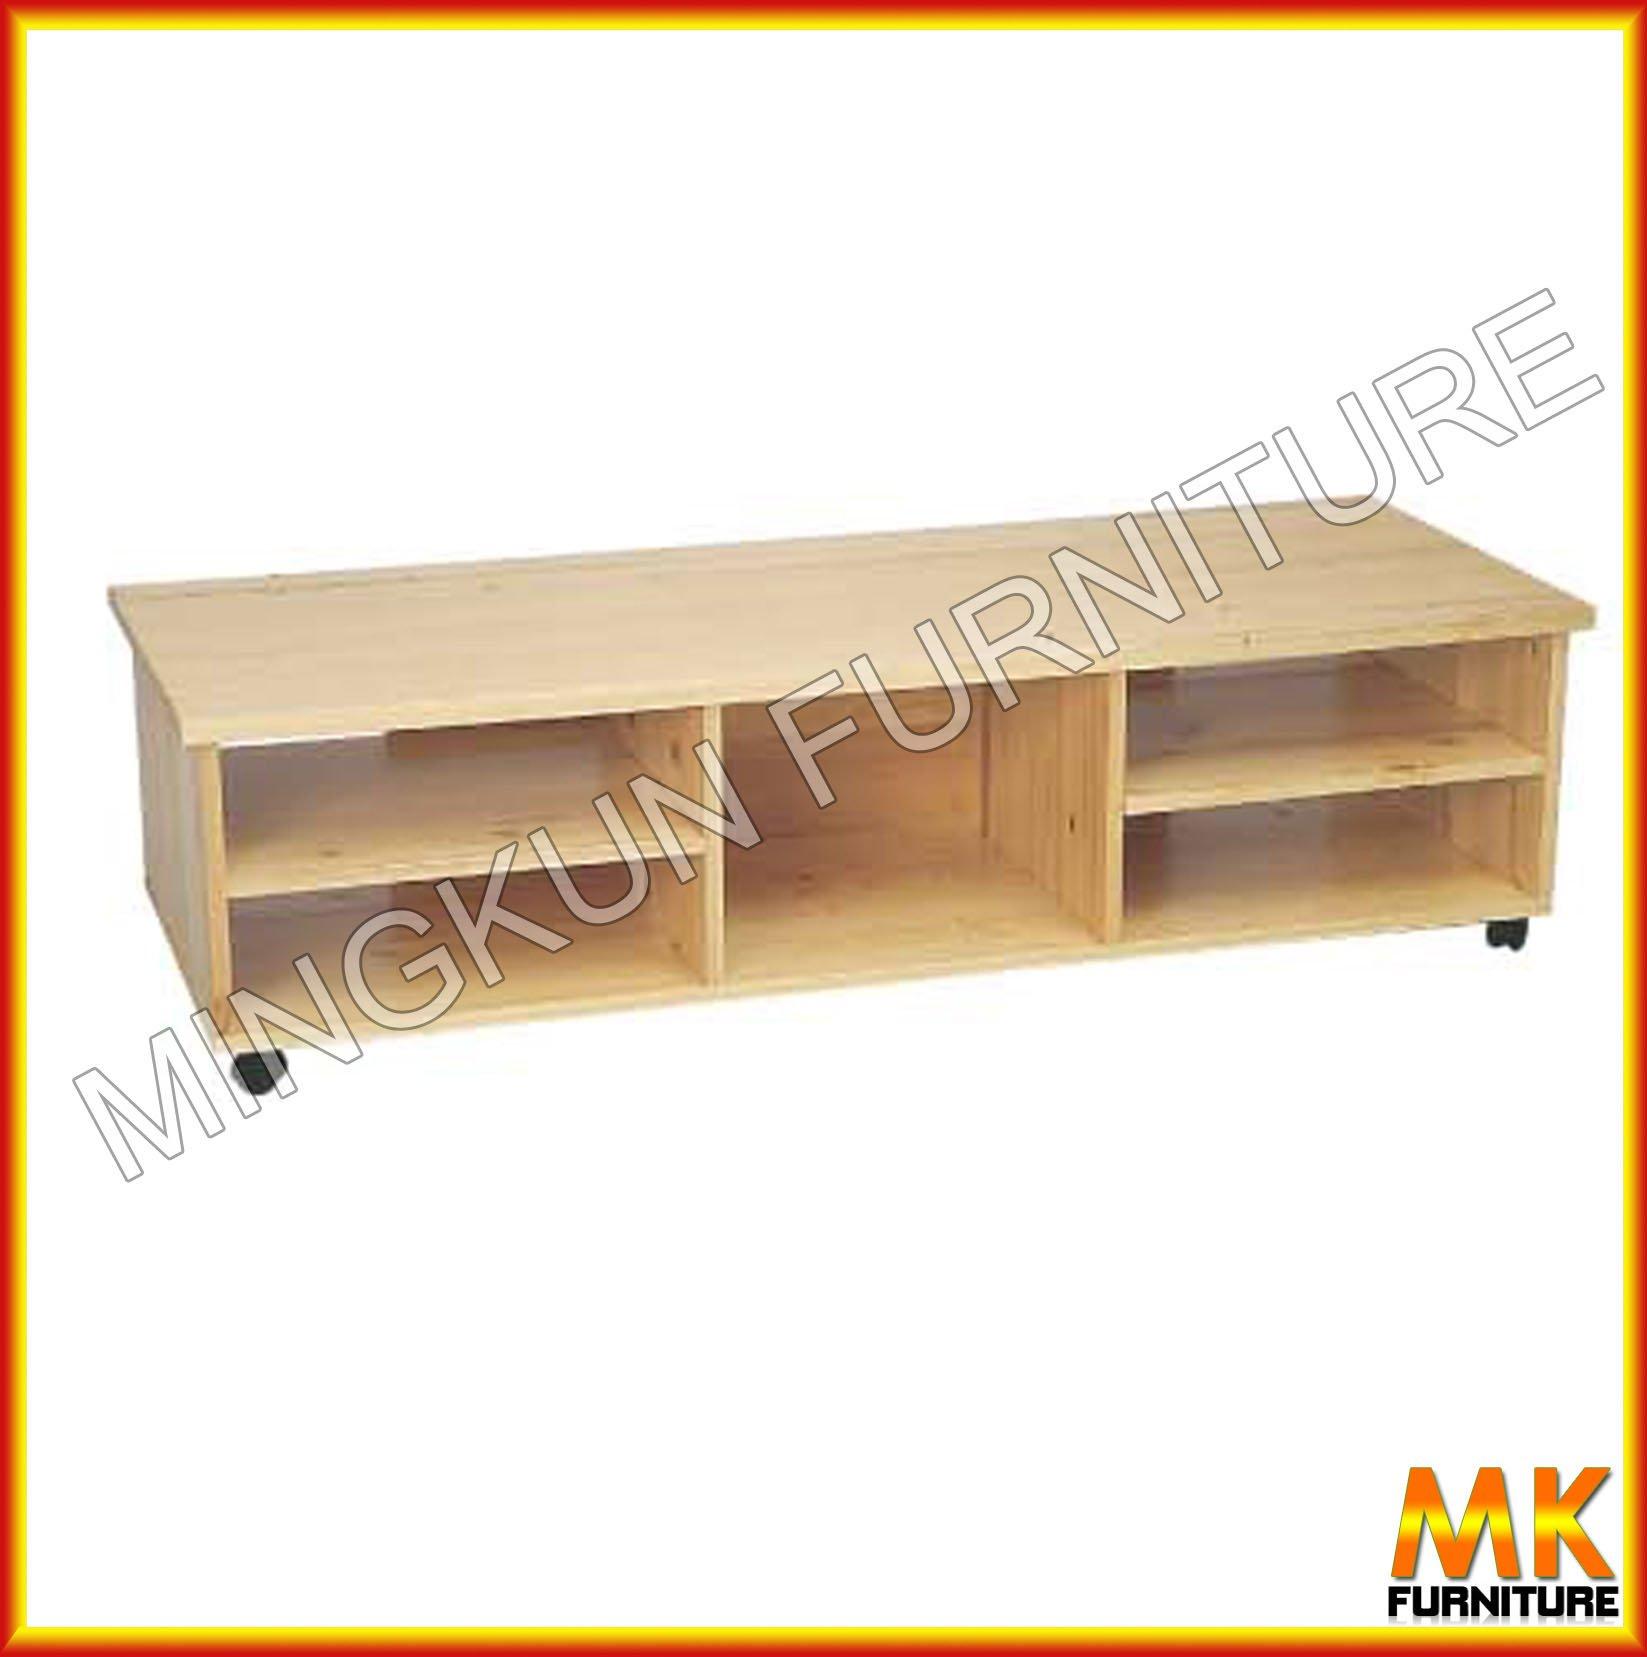 Televisi n soporte de madera de abedul de madera muebles - Madera de abedul ...